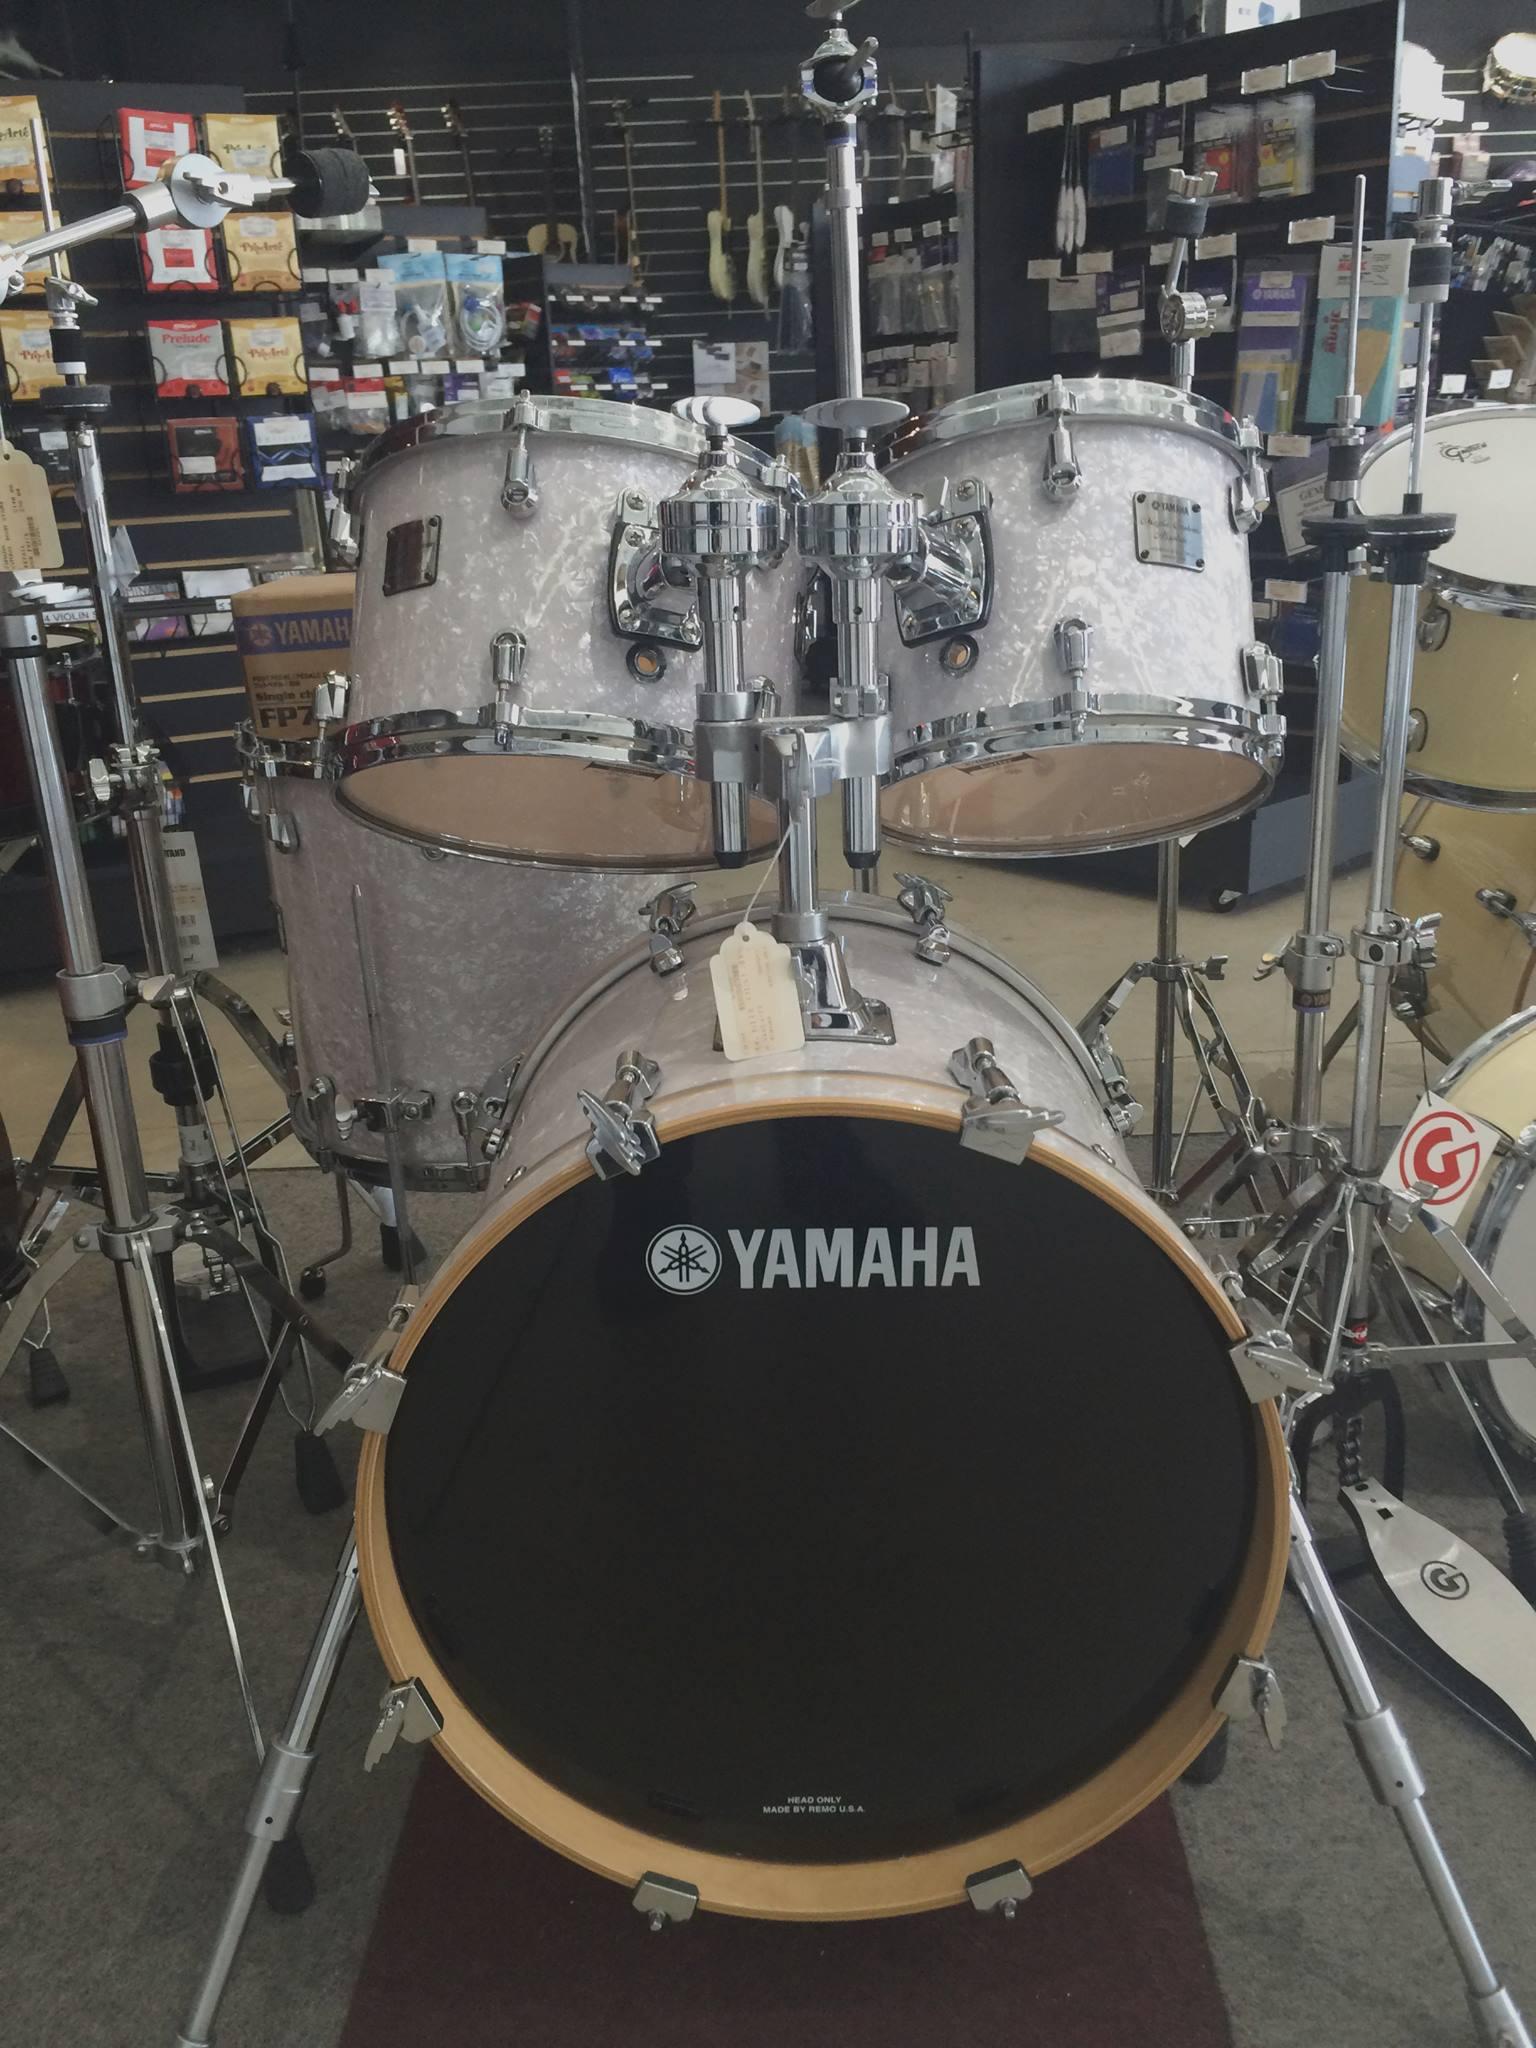 HS Music Service Inc - Drums- San Antonio, TX